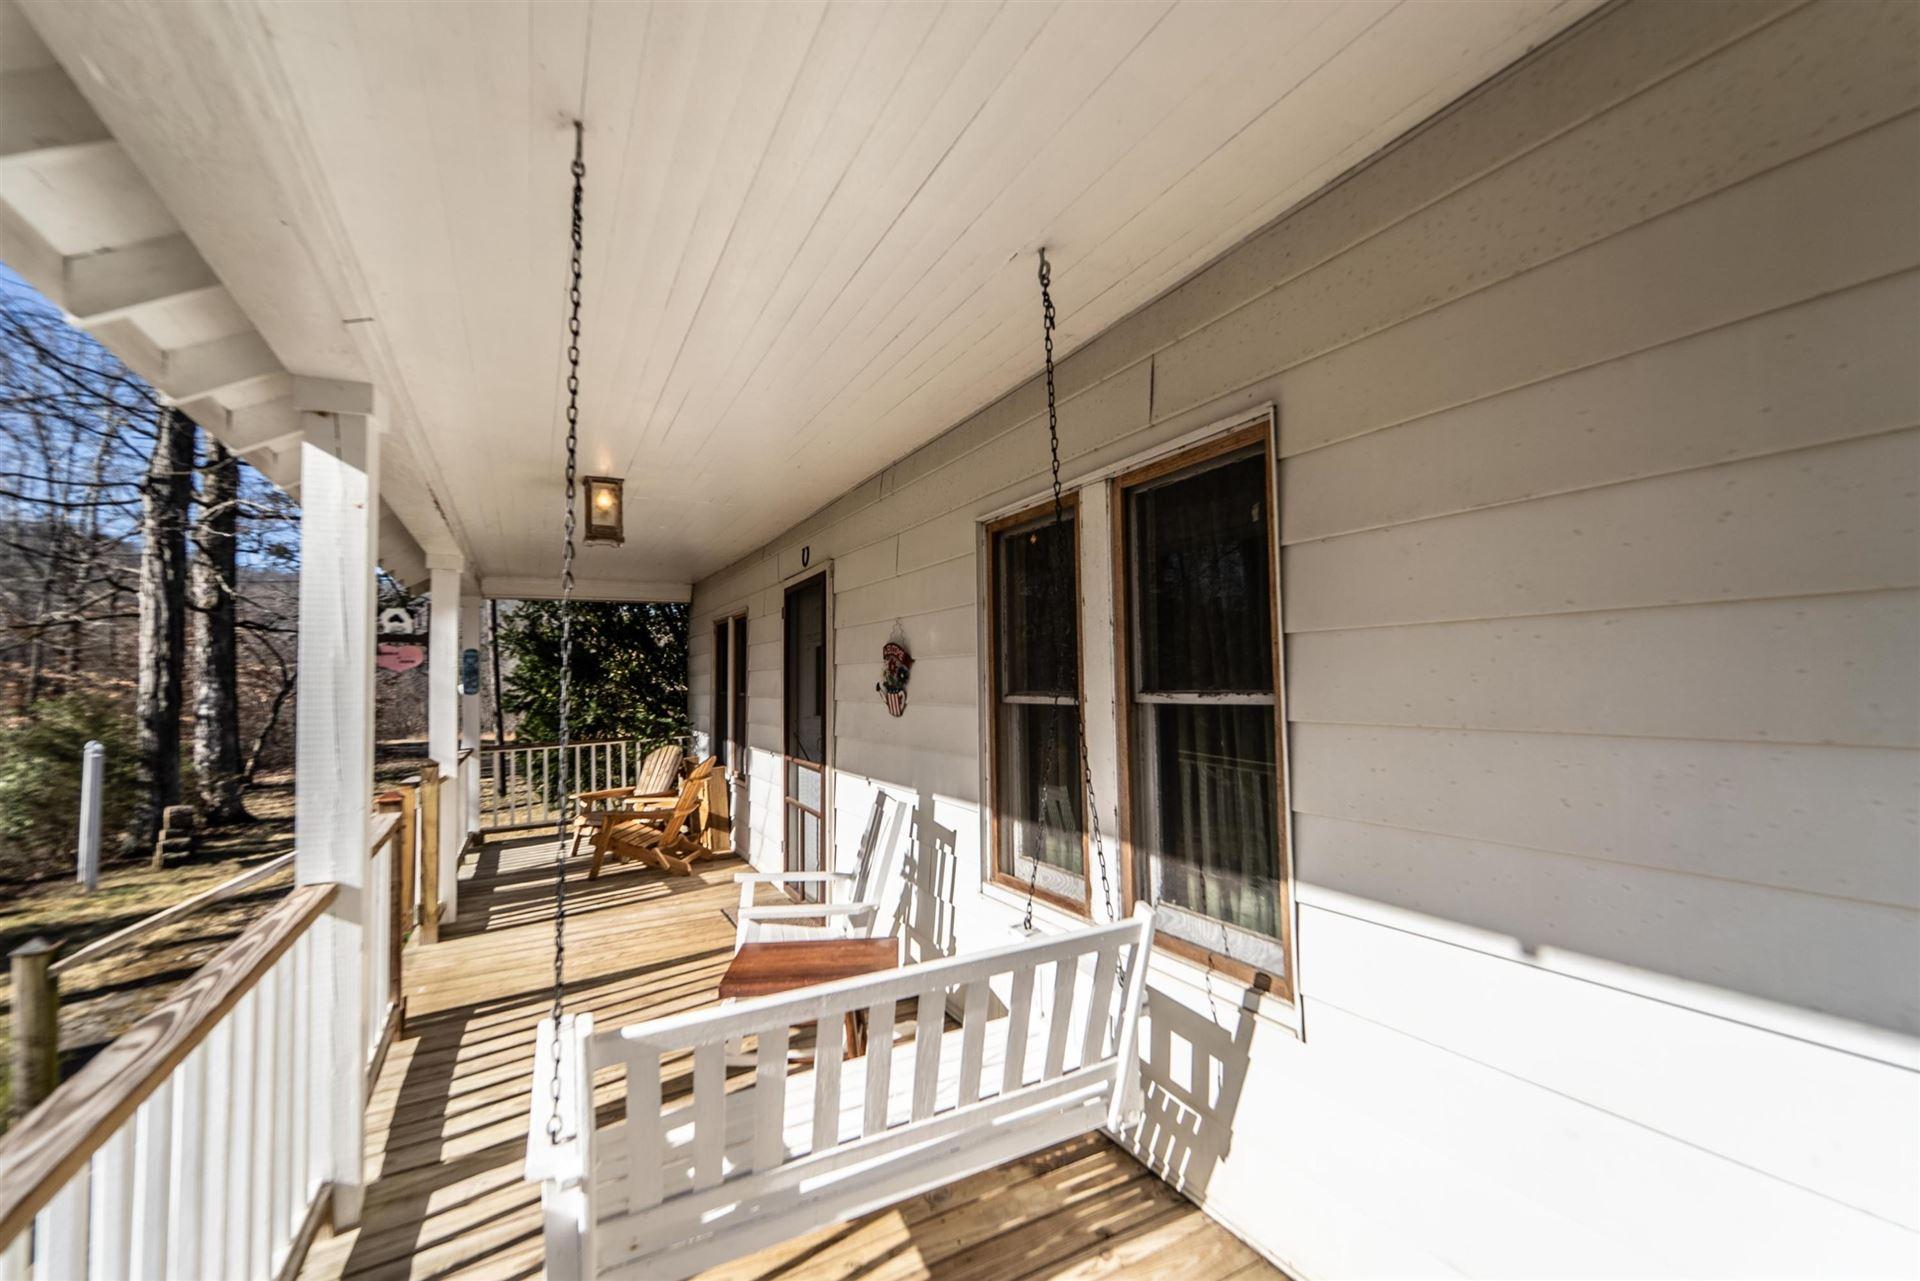 Photo of 3150 Livingston Hwy, Jamestown, TN 38556 (MLS # 1140138)